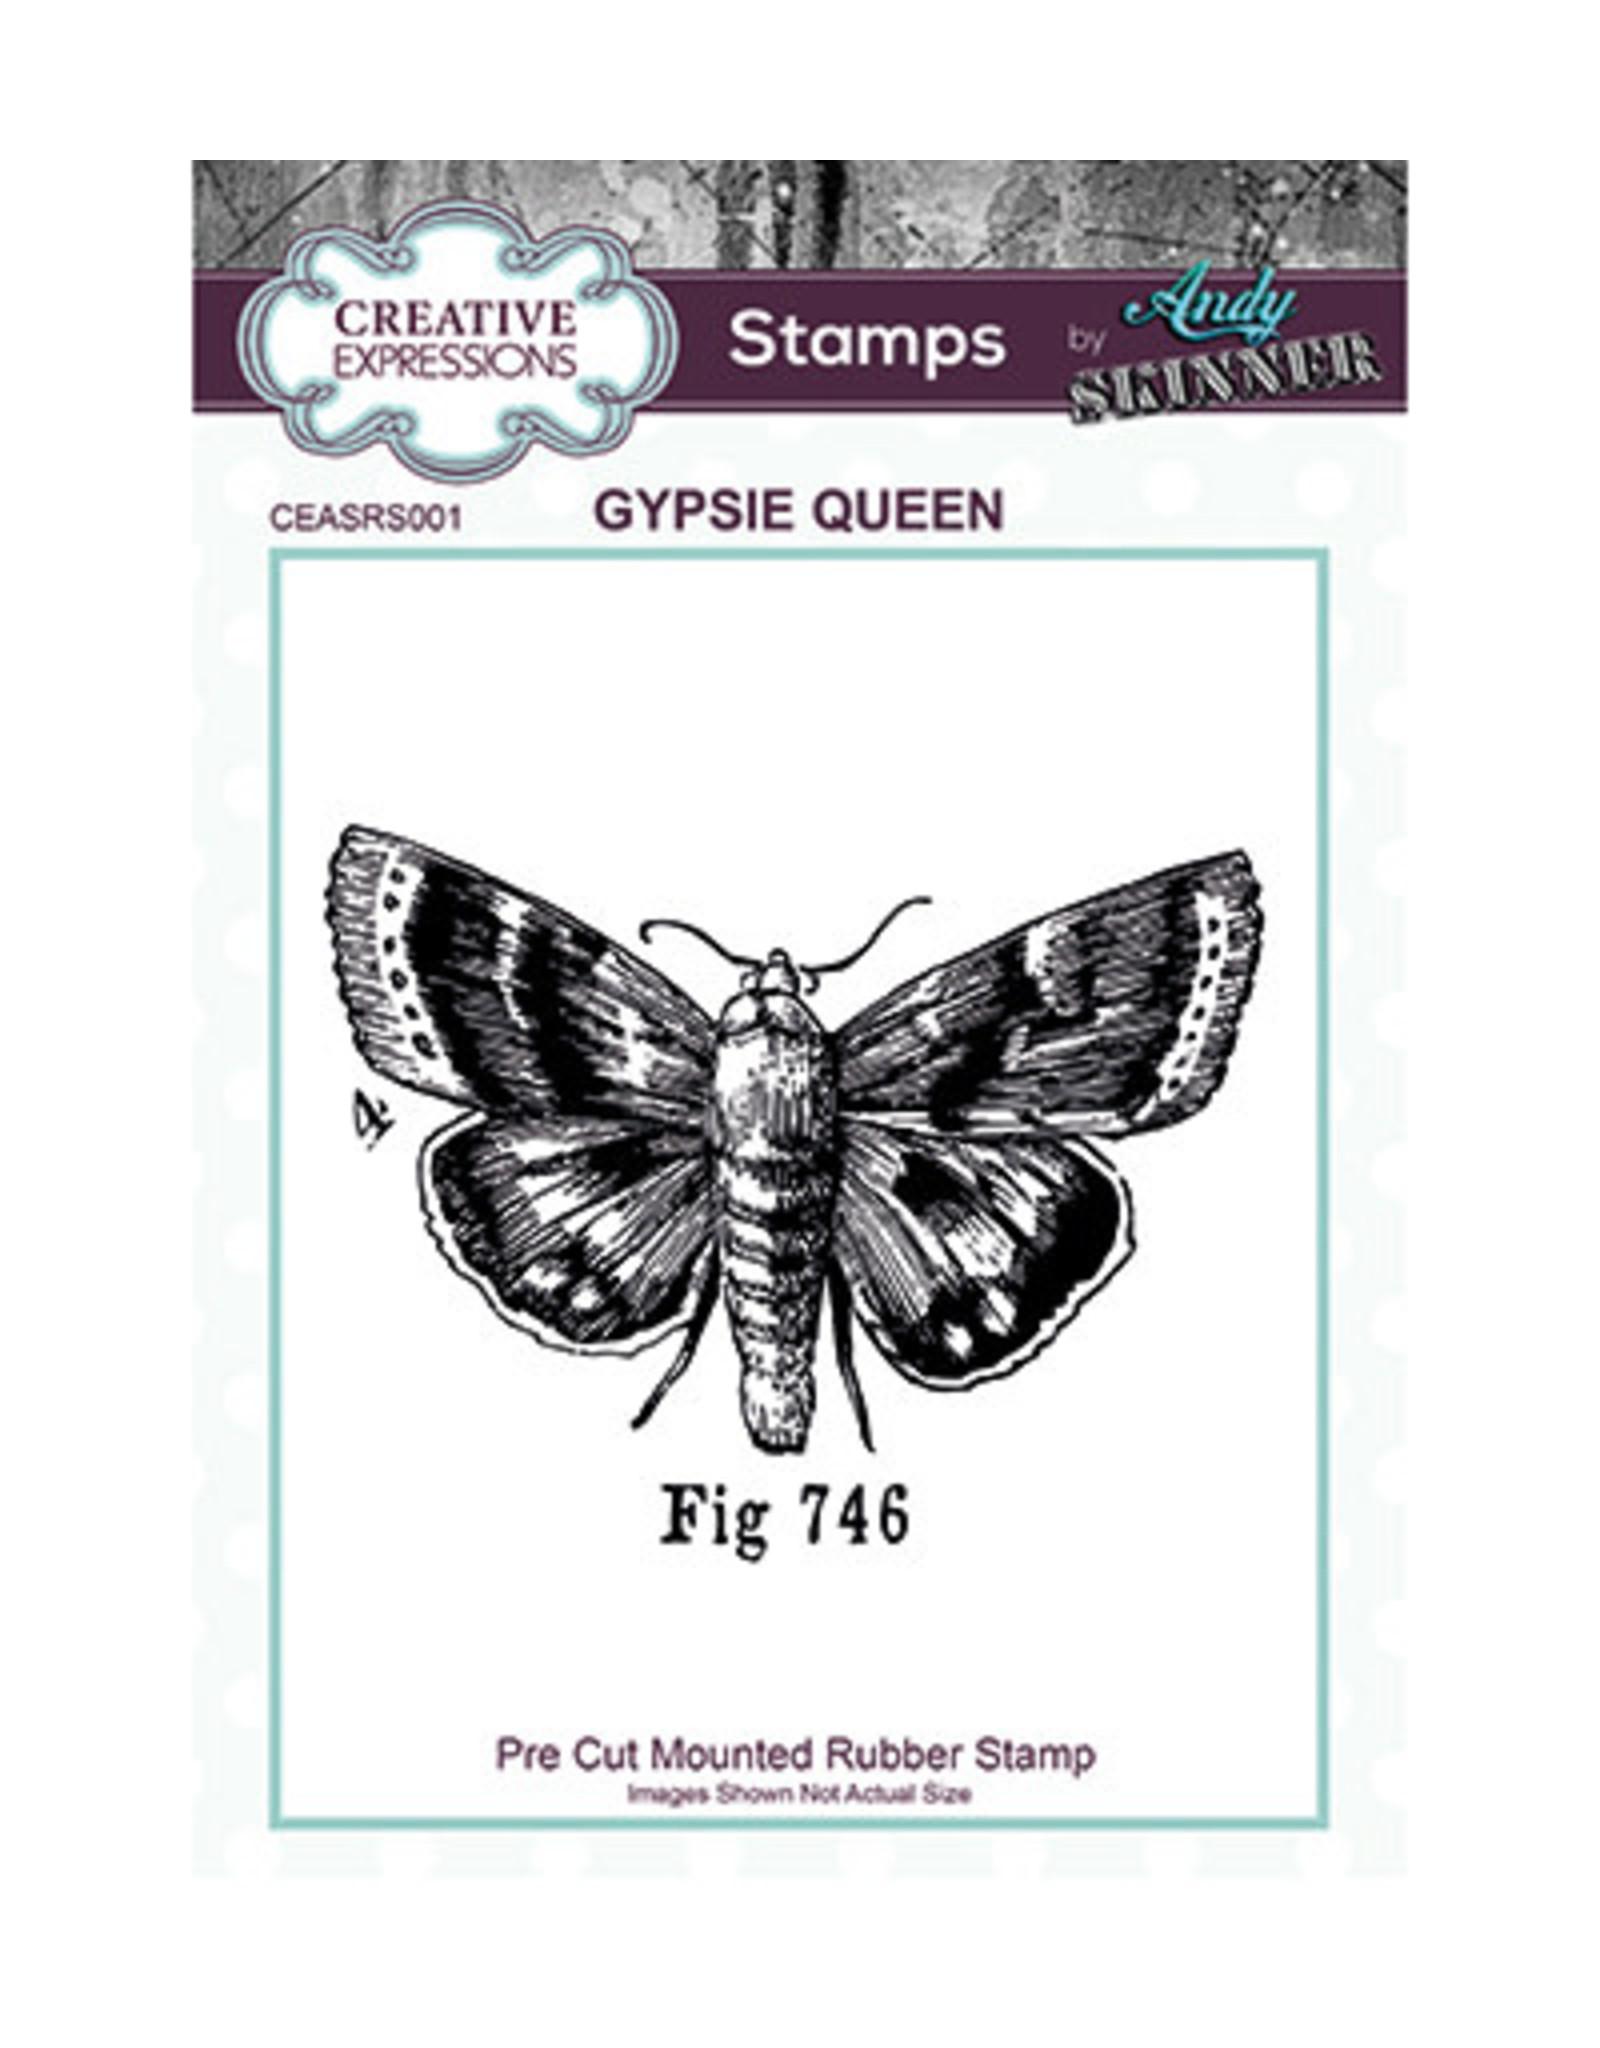 Creative Expressions Creative Expressions Pre Cut Rubber Stamp Gypsie Queen  Andy Skinner CEASRS001